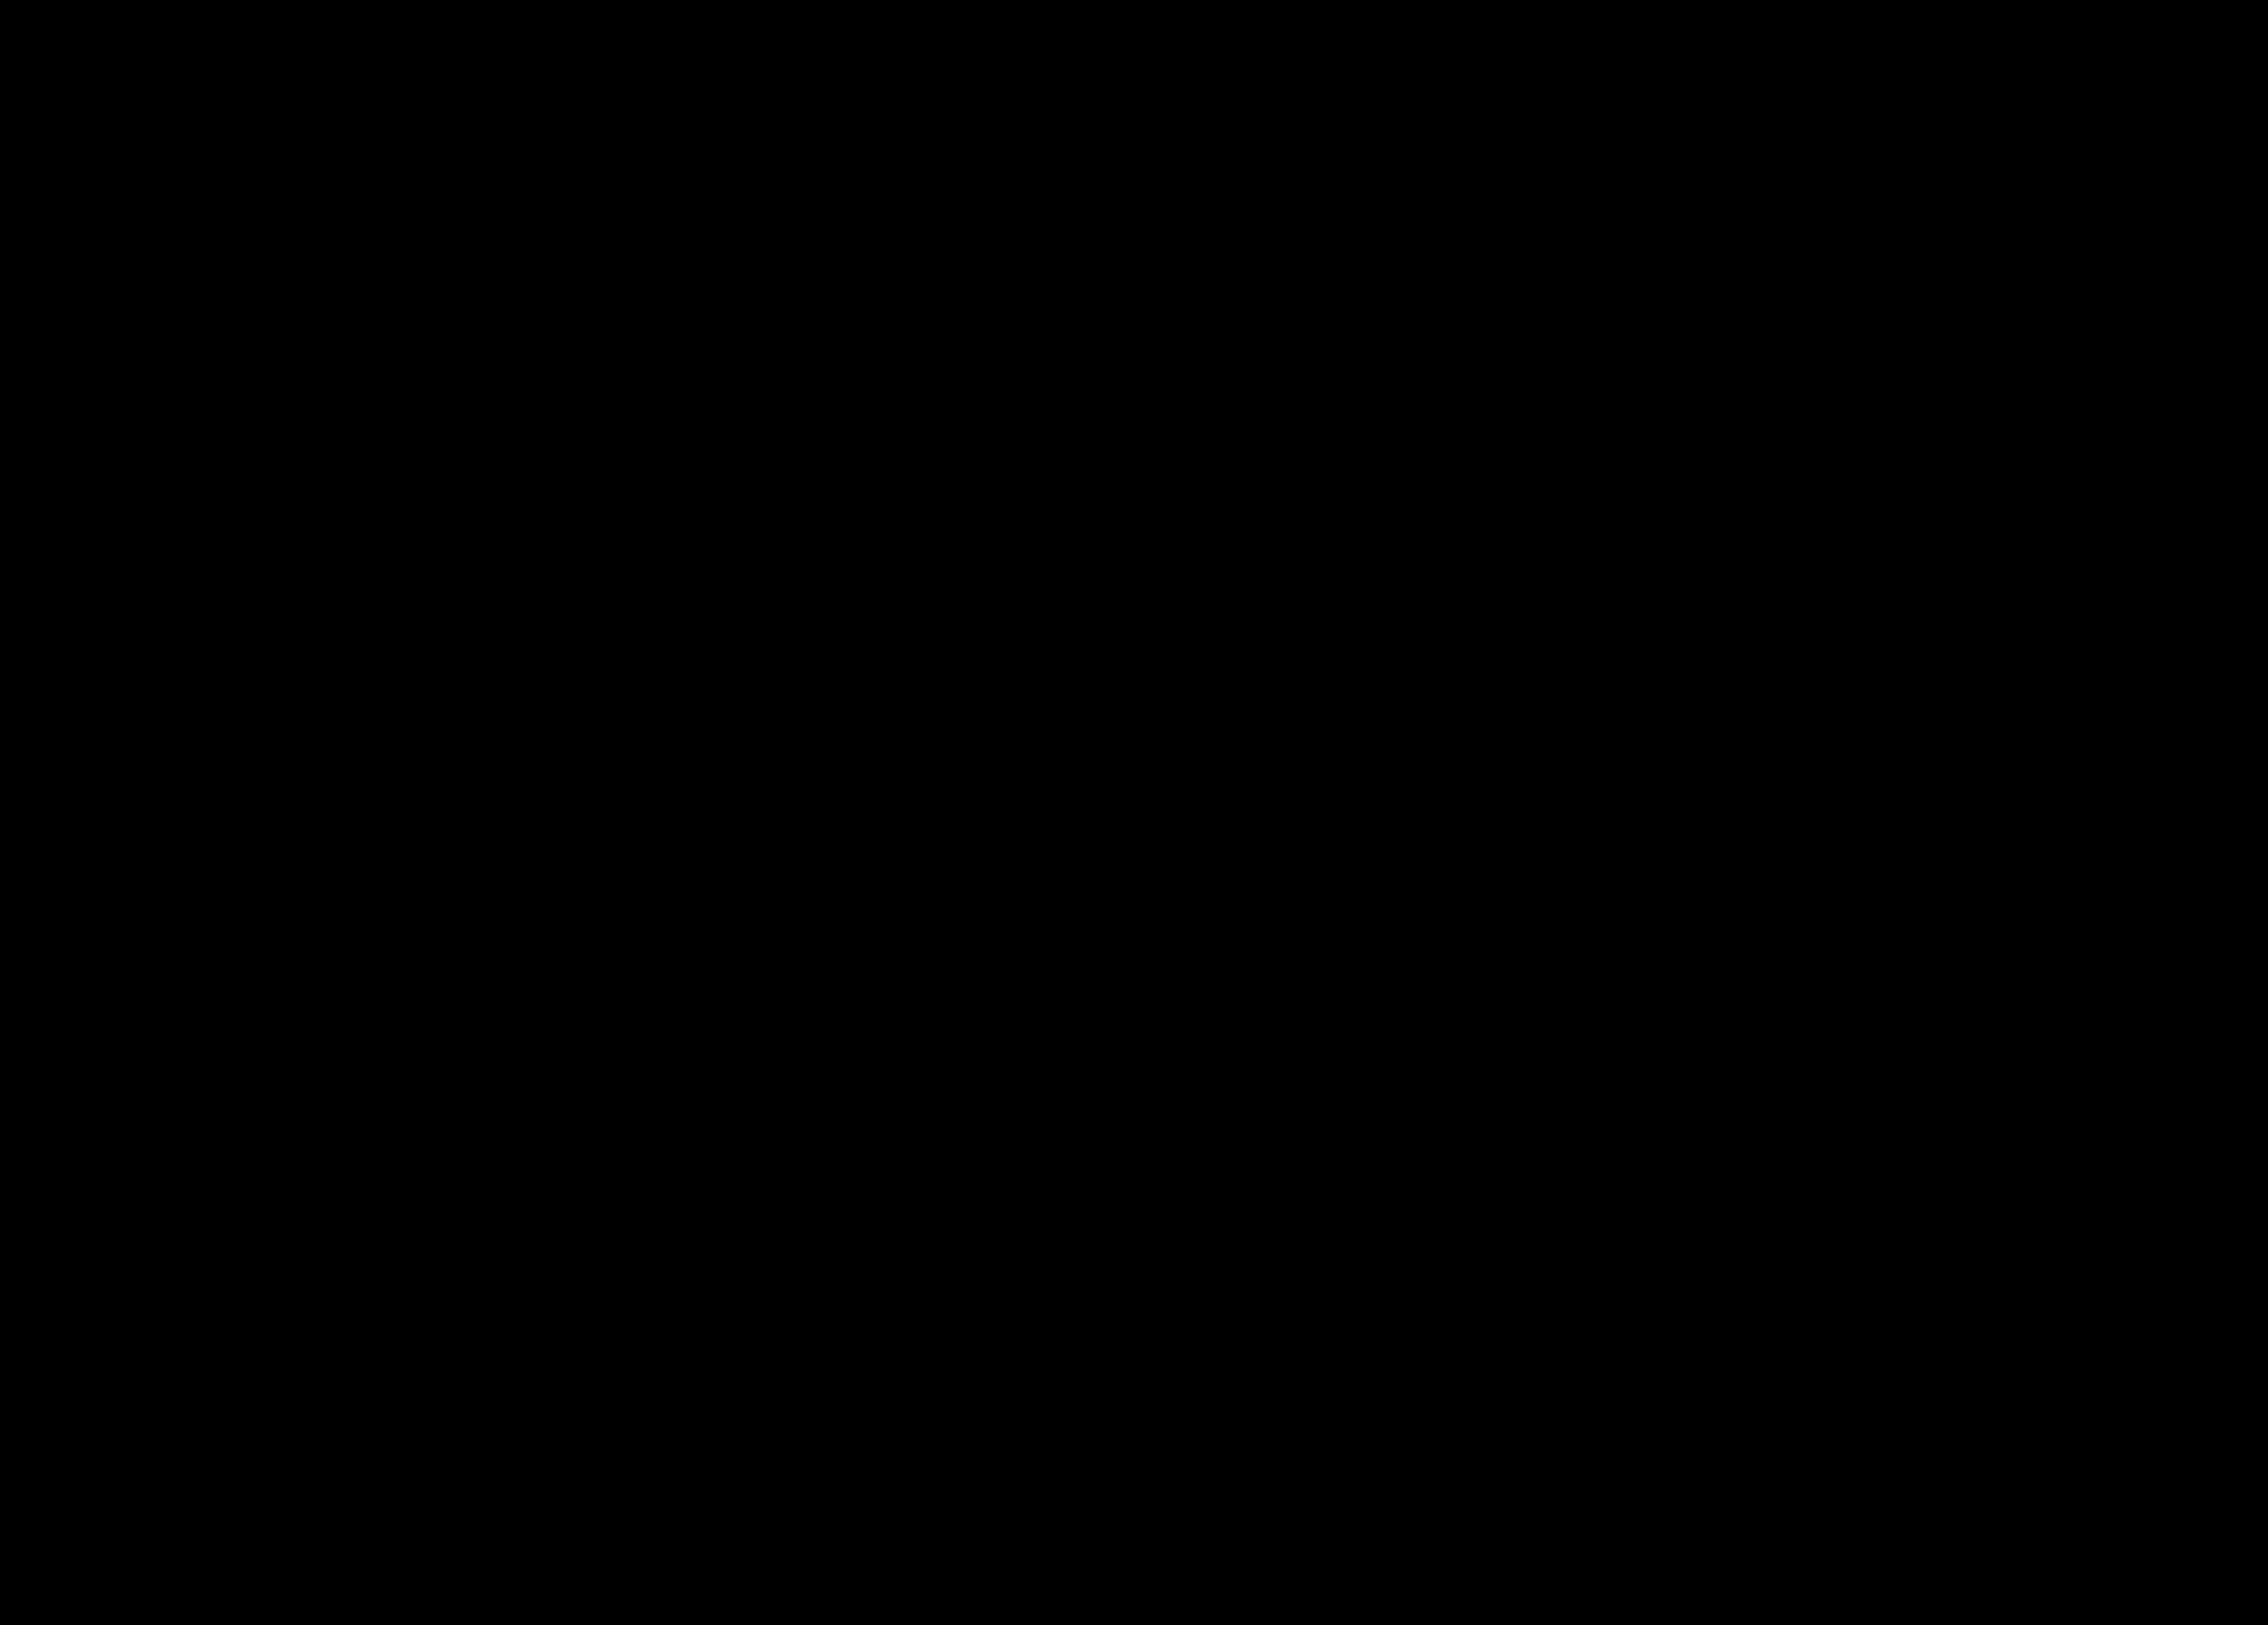 Colgate palmolive logo clipart jpg black and white library Colgate-Palmolive – Logos Download jpg black and white library